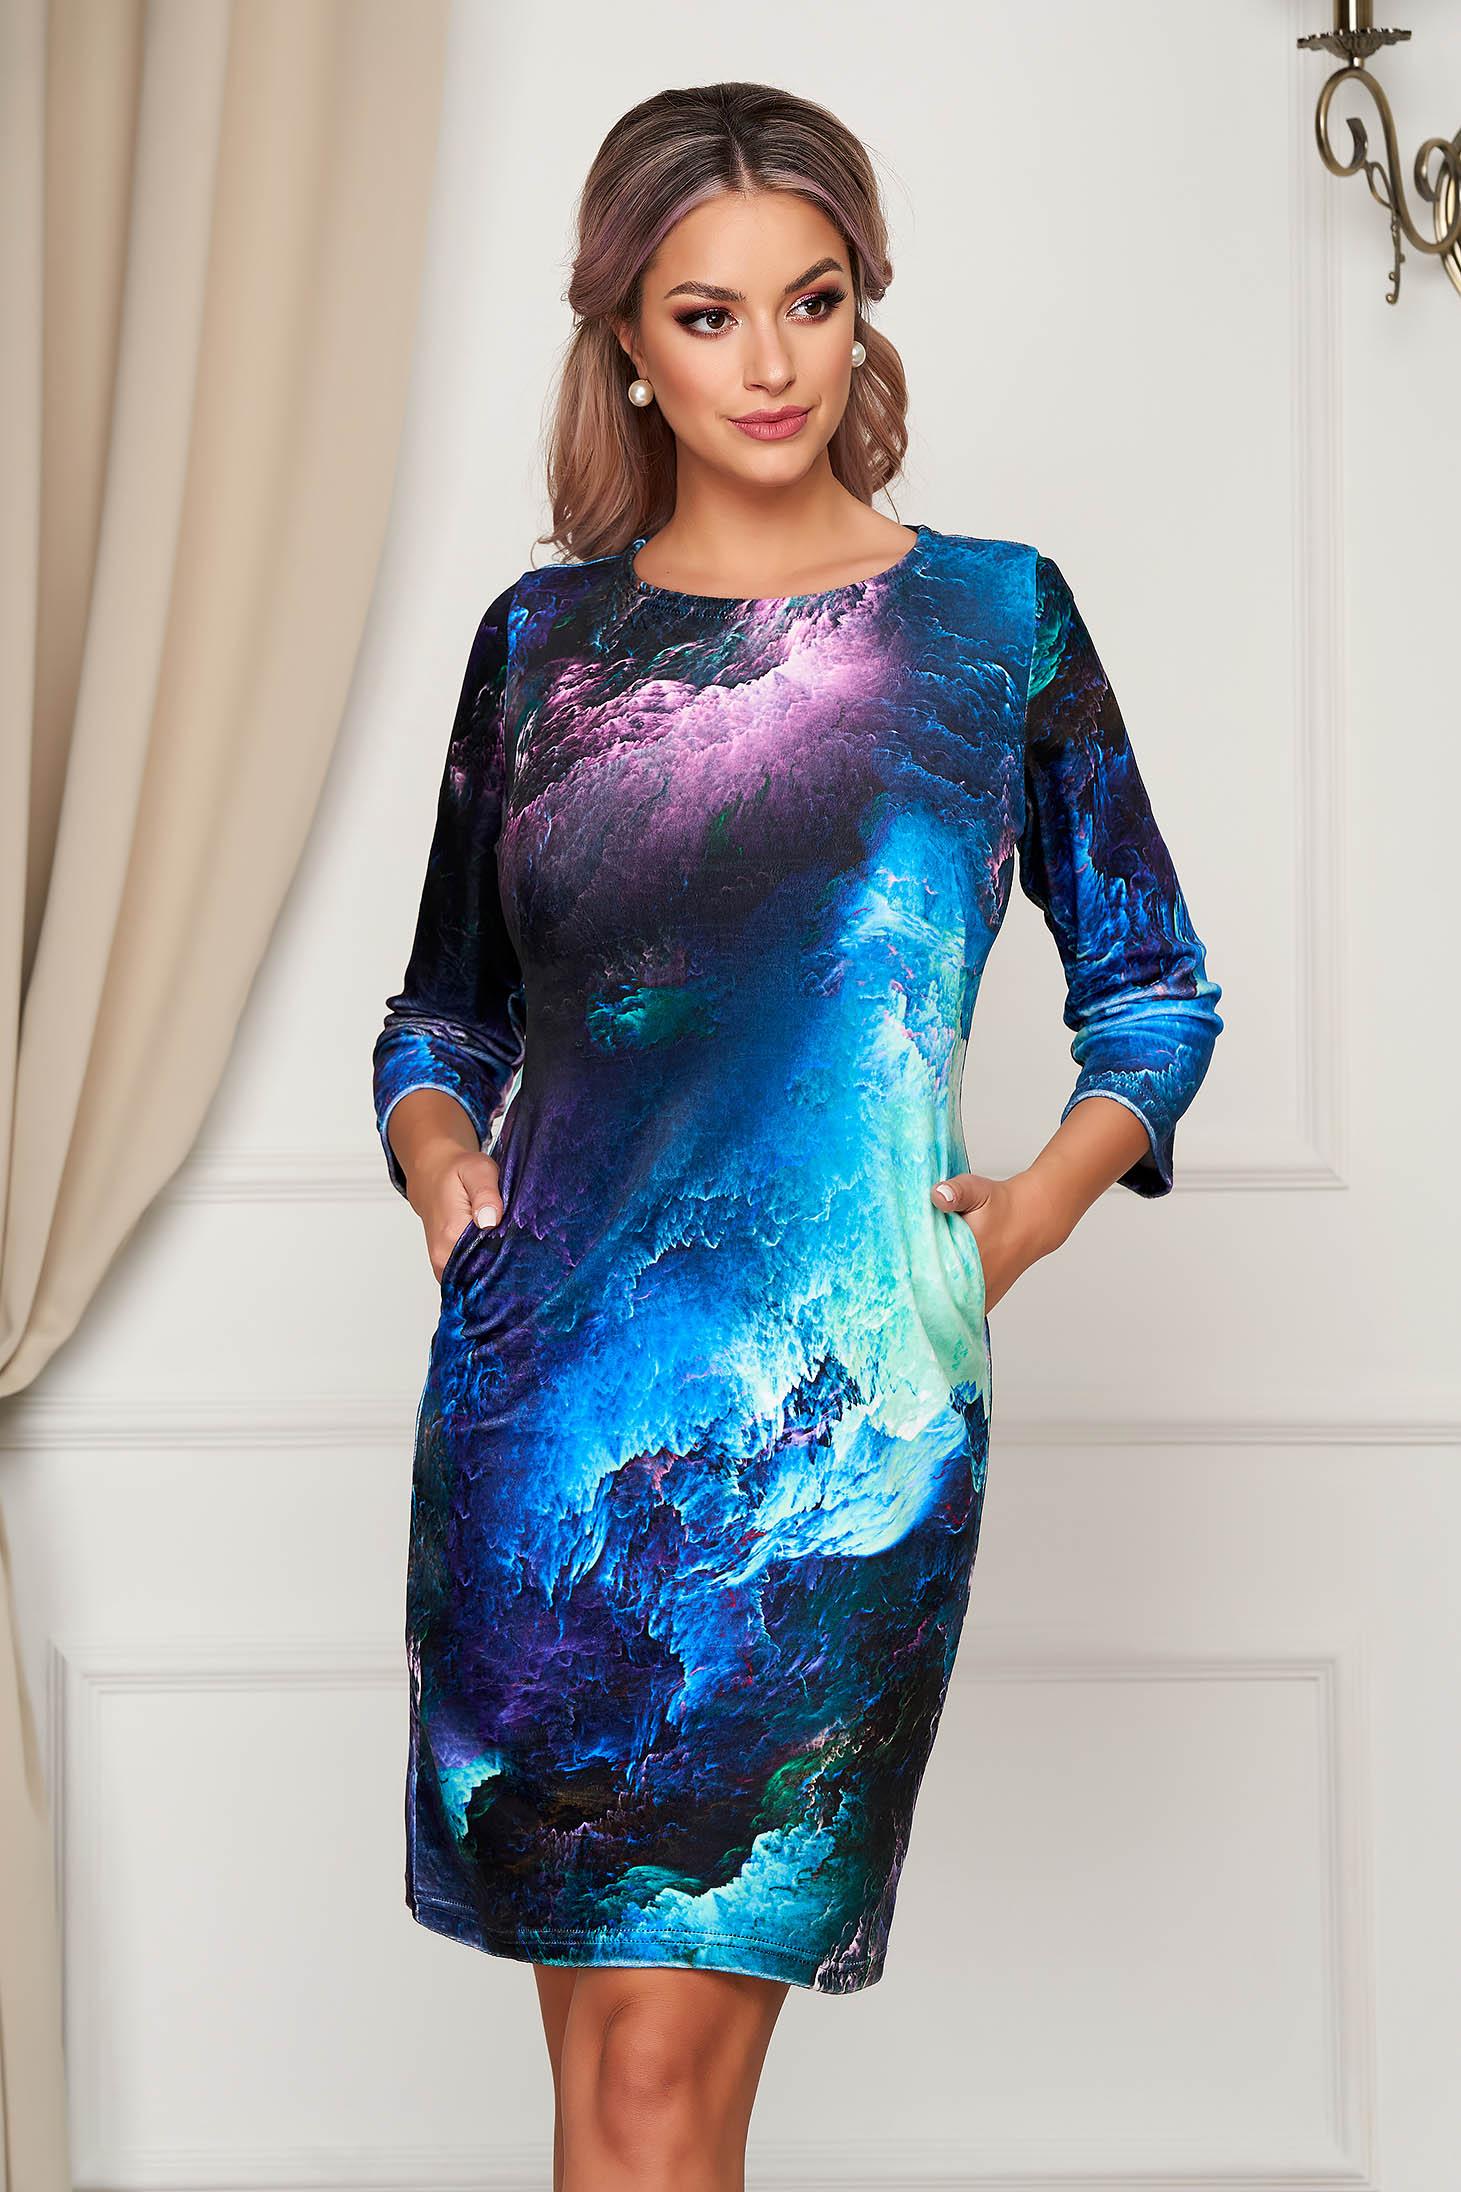 Blue dress short cut daily straight from velvet fabric